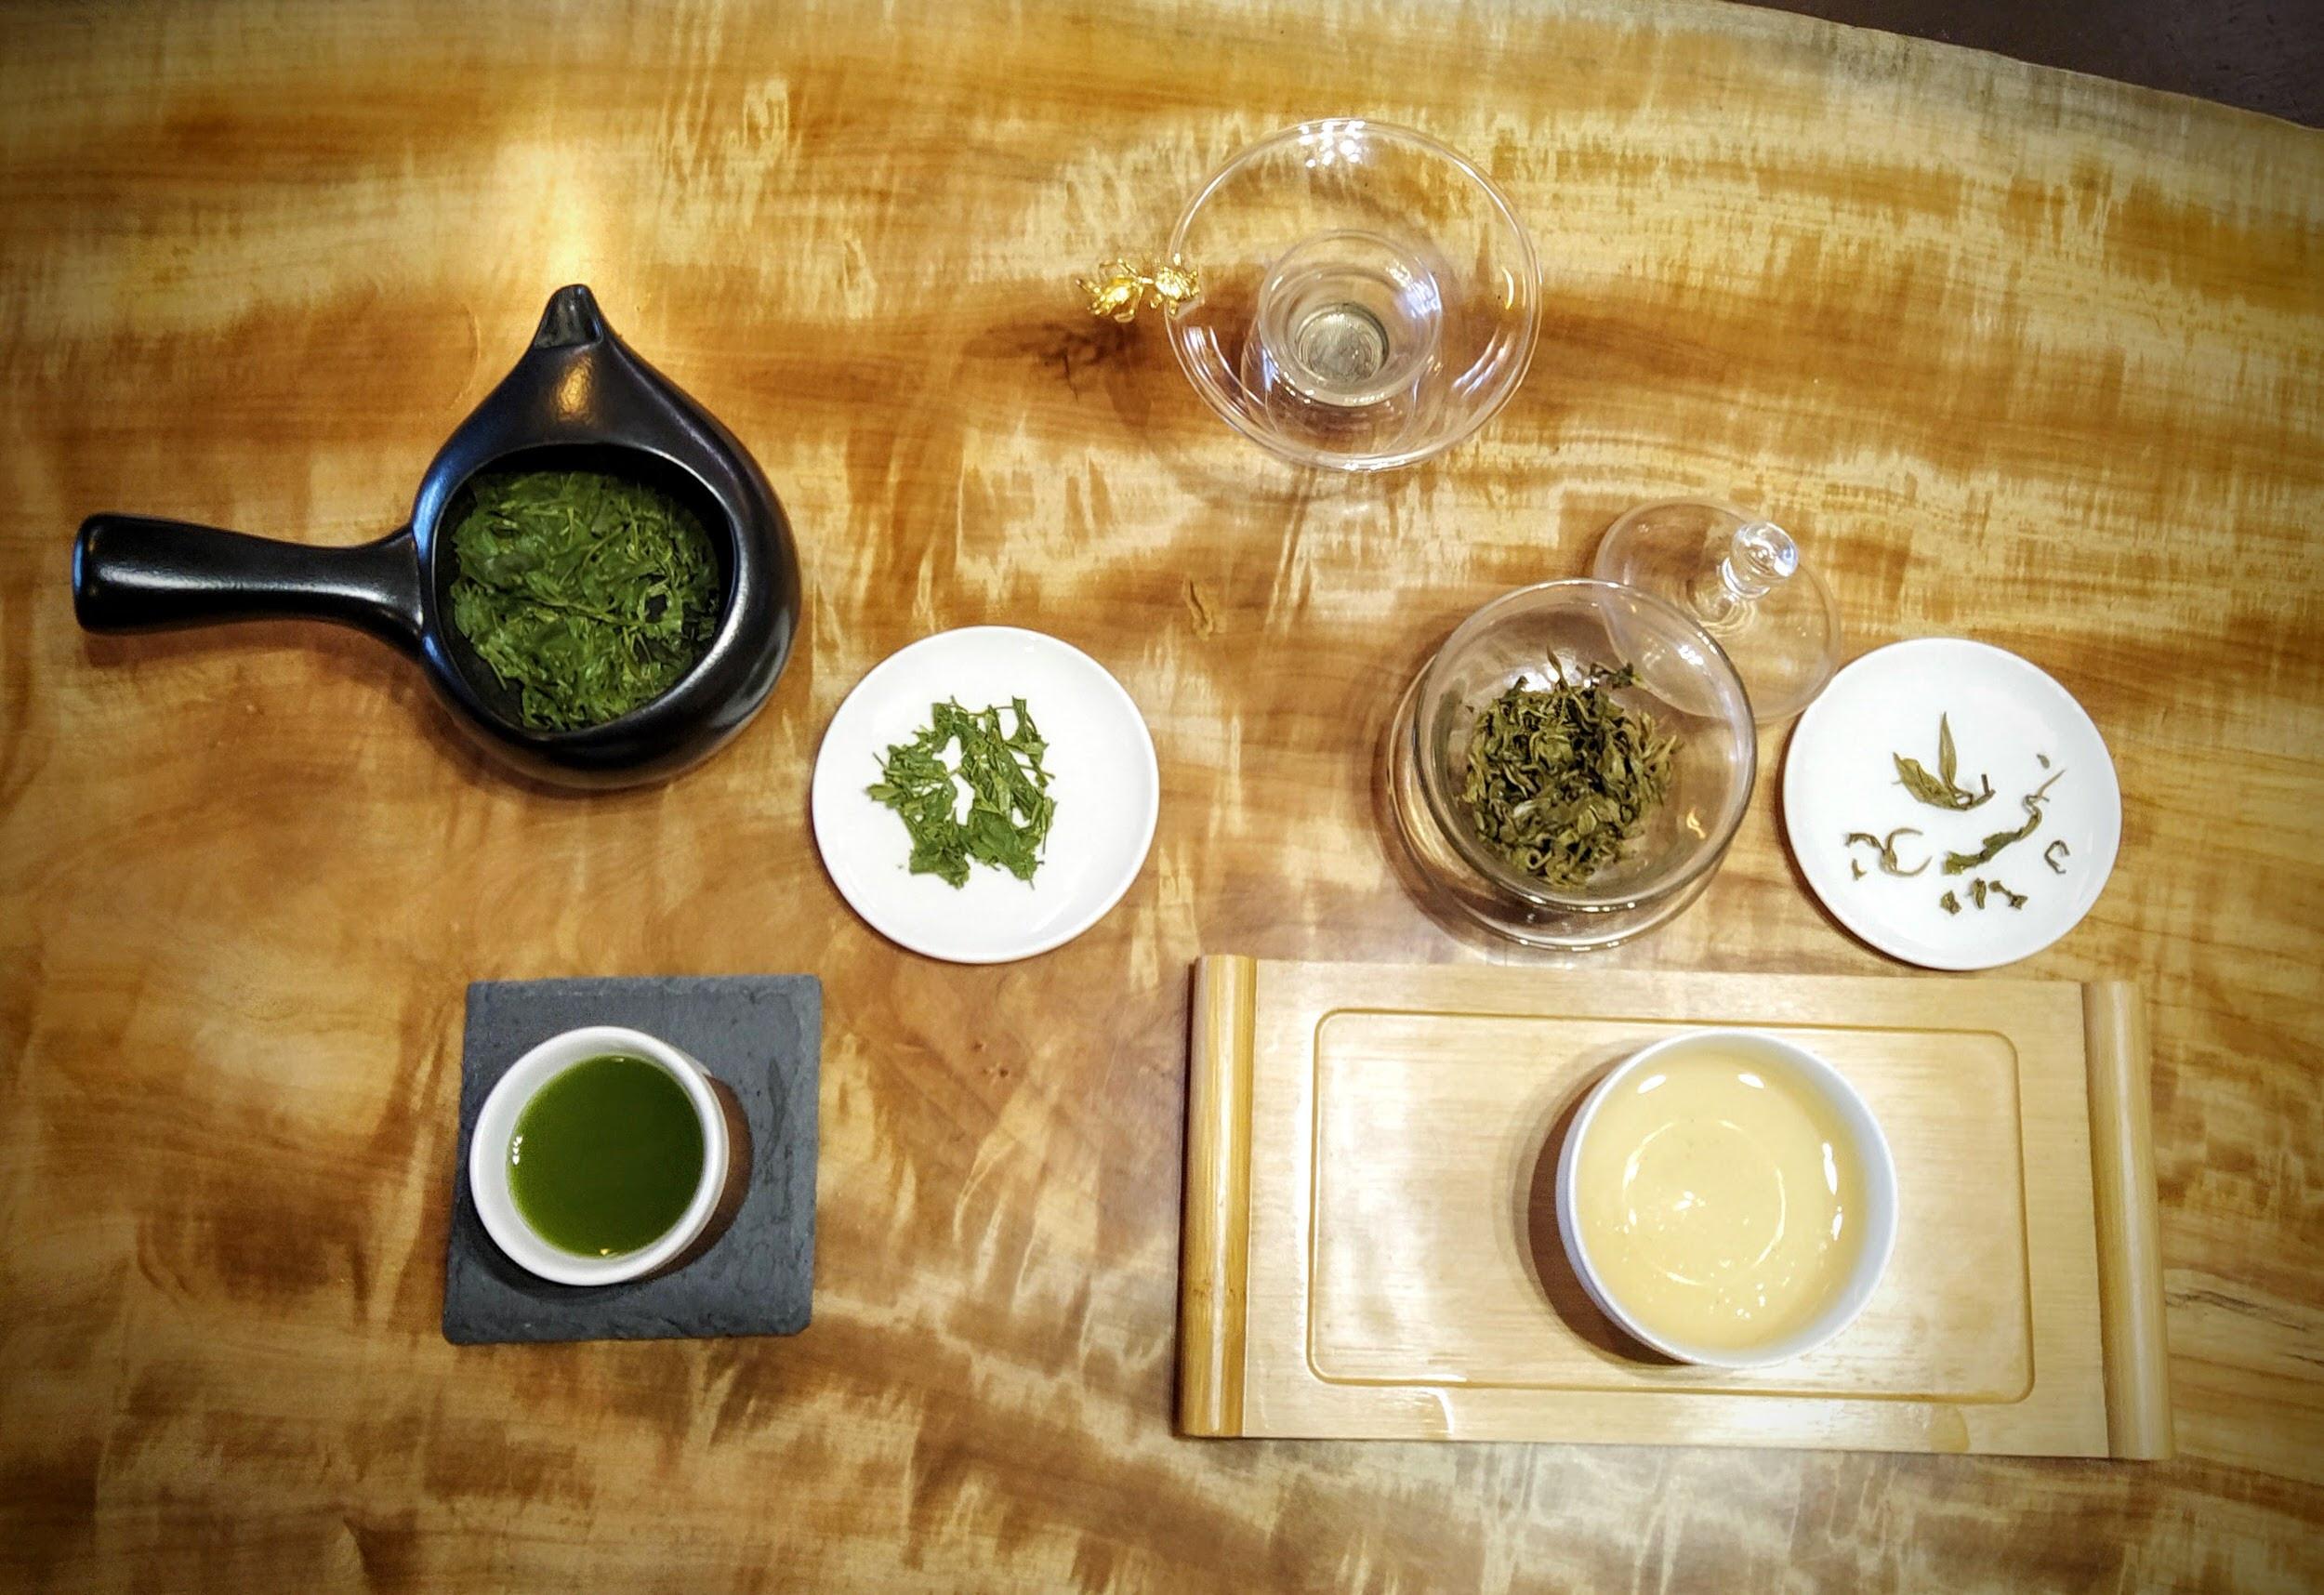 JAPANESE GREEN TEA VS CHINESE GREEN TEA